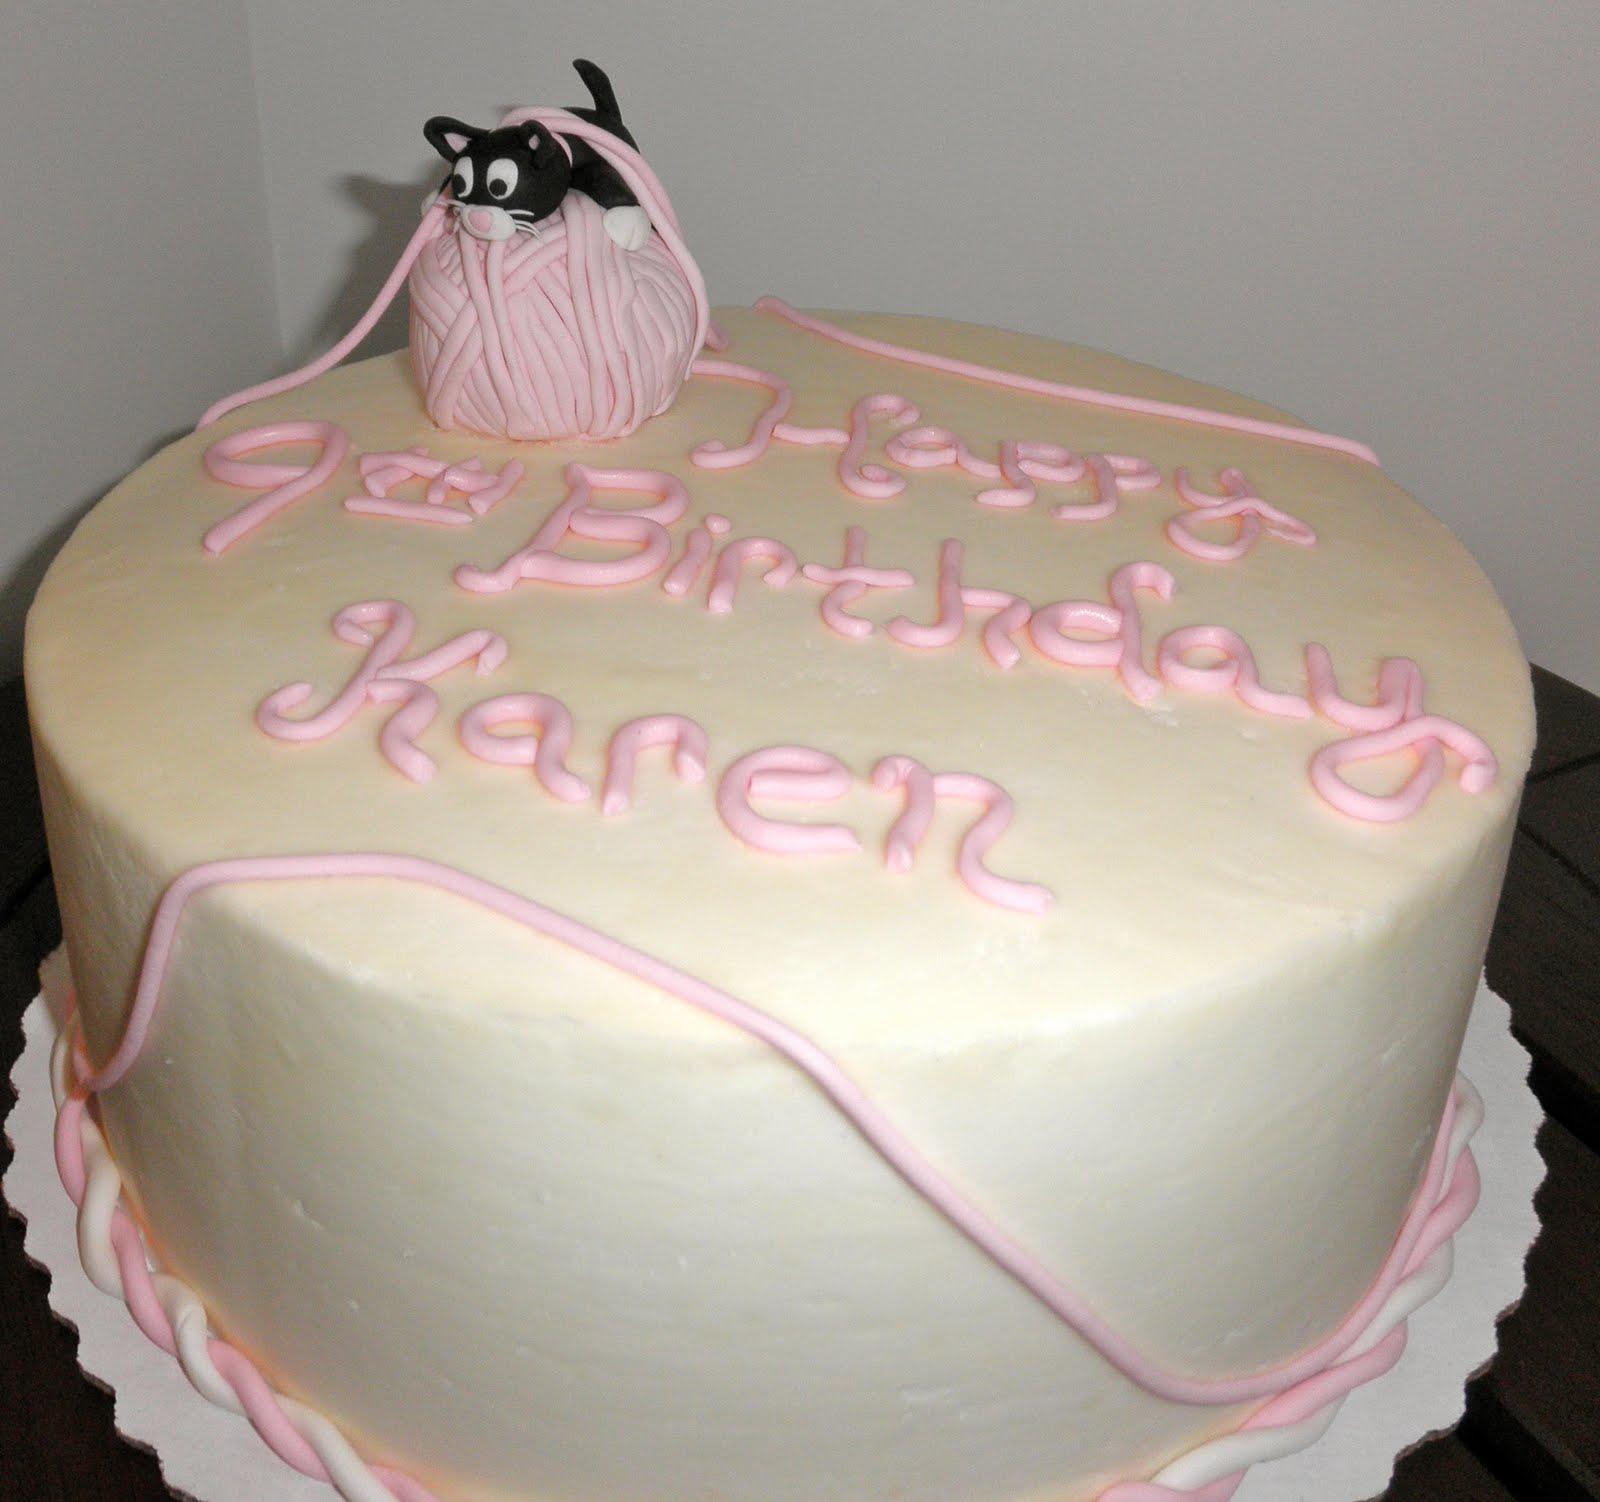 Sweet T's Cake Design: Black & White Cat On Pink Ball Of